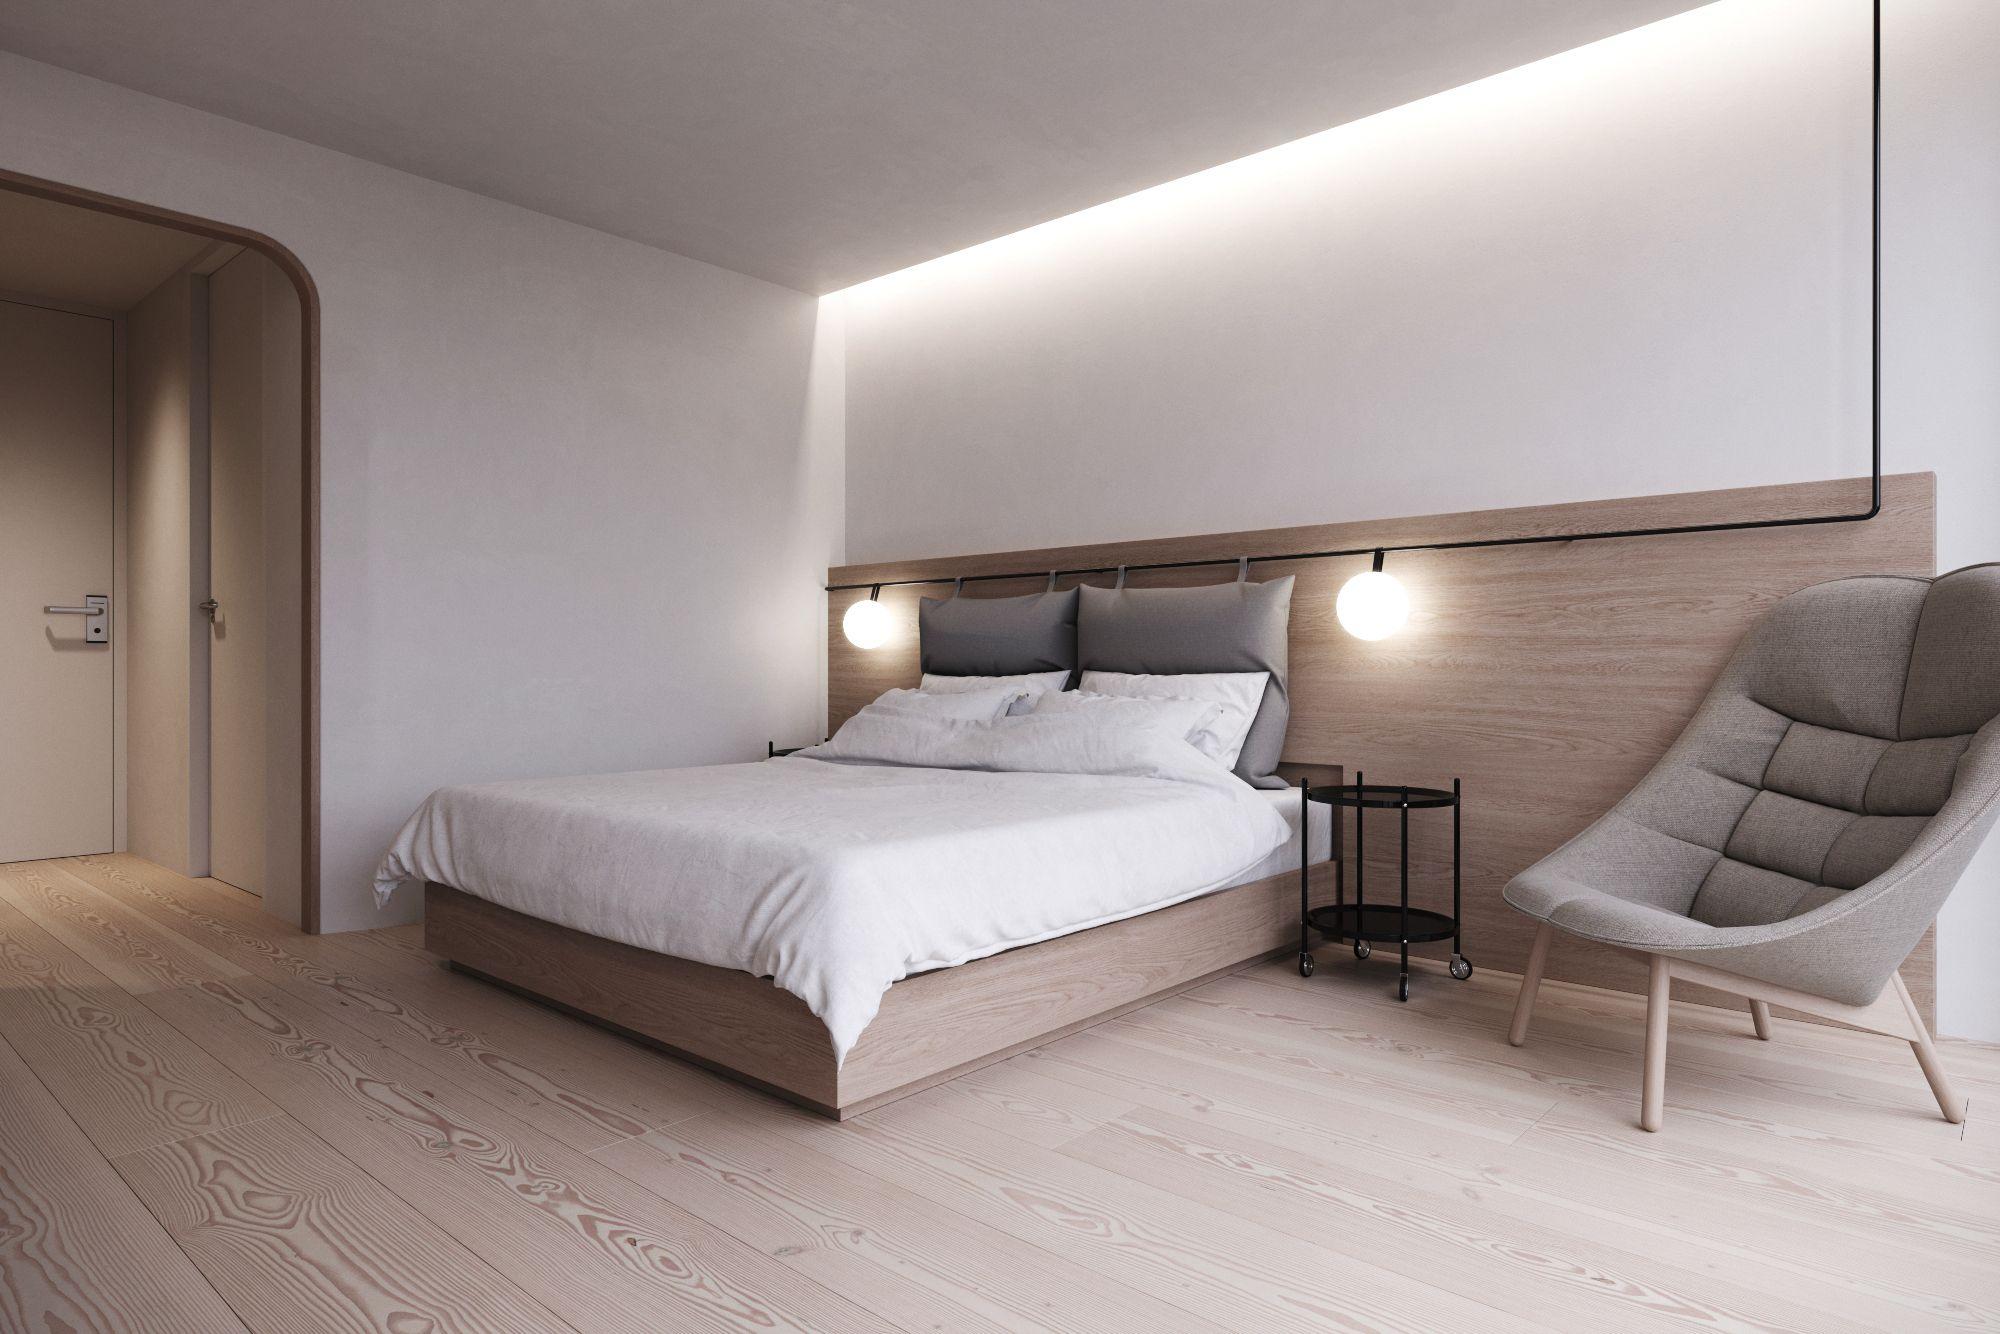 Welcome Hotel Minimalist Bedroom Minimalist Home Furniture Hotel Room Design